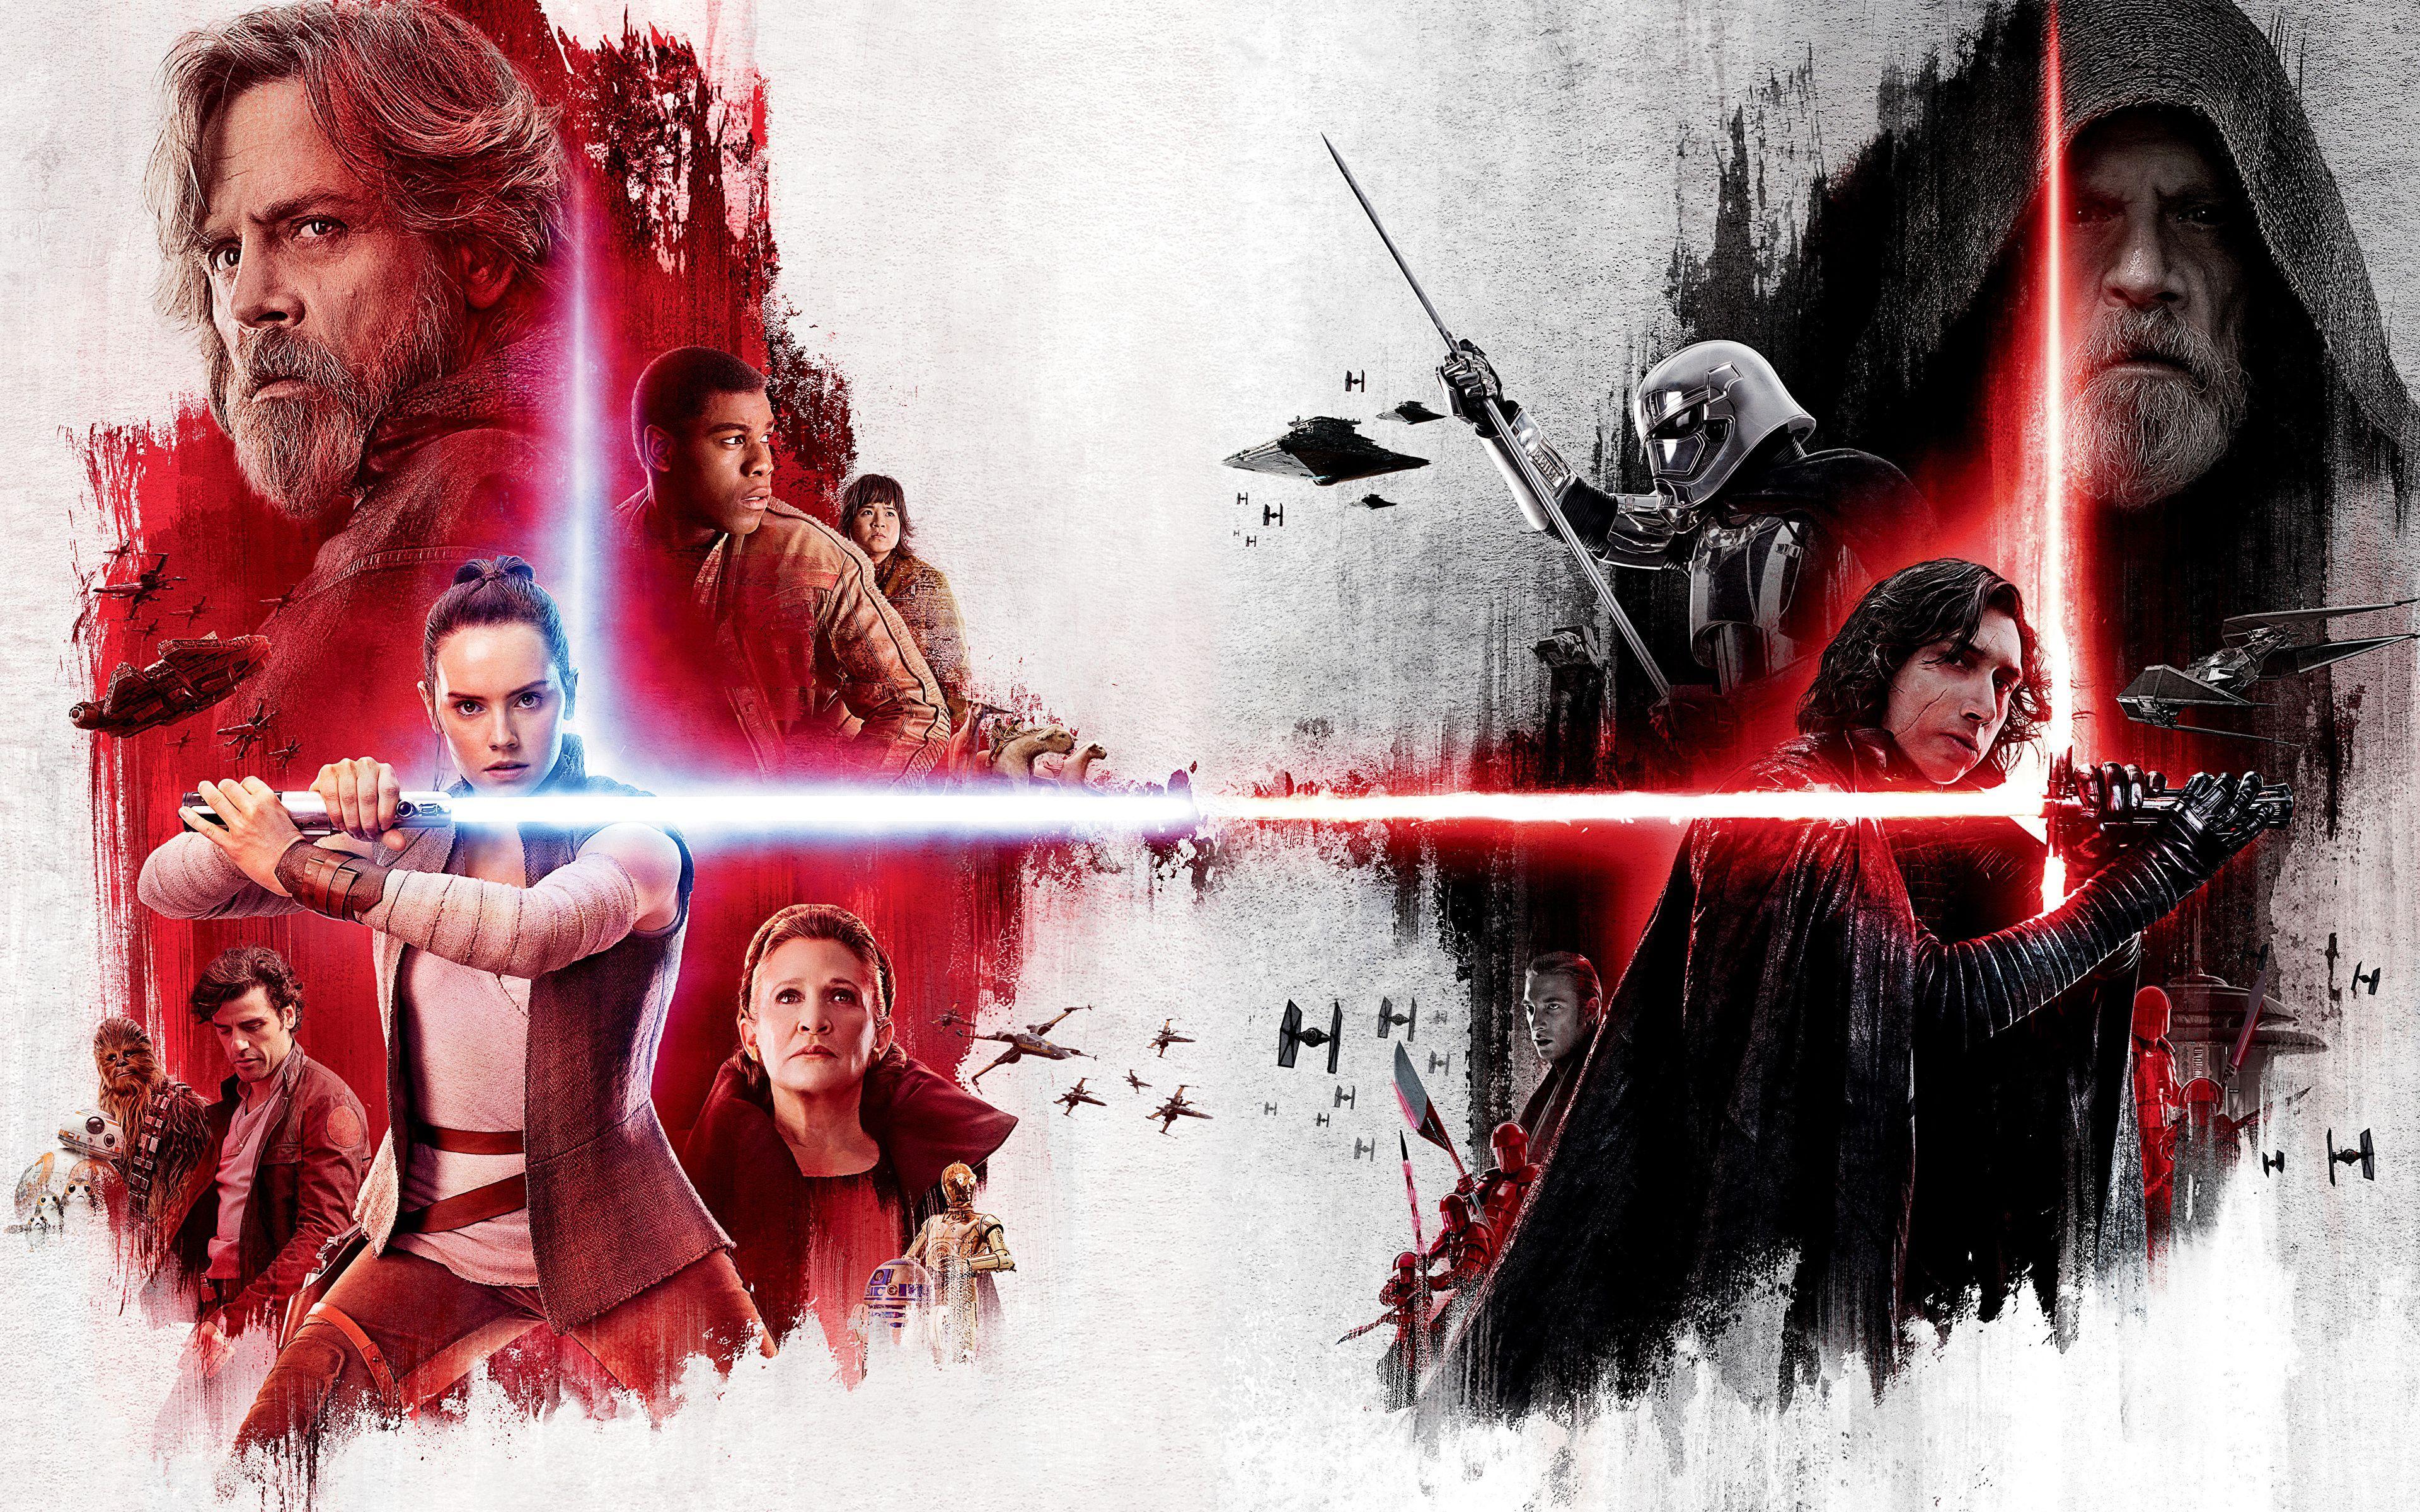 Supreme Leader Snoke Wallpapers Top Free Supreme Leader Snoke Backgrounds Wallpaperaccess